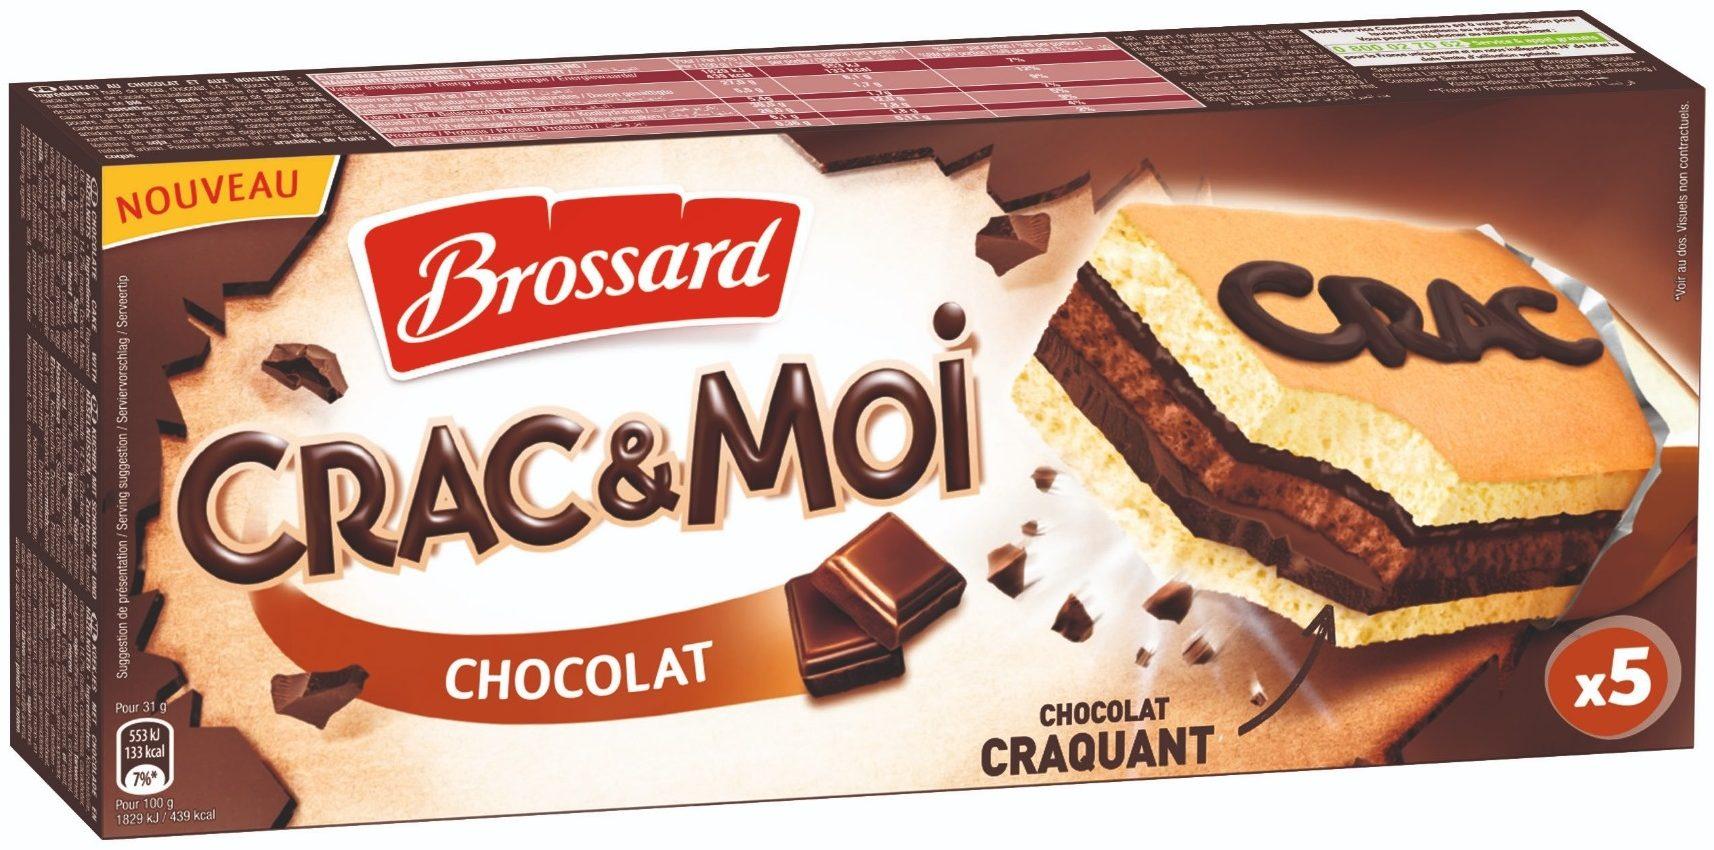 Crac & Moi Chocolat - Produit - fr